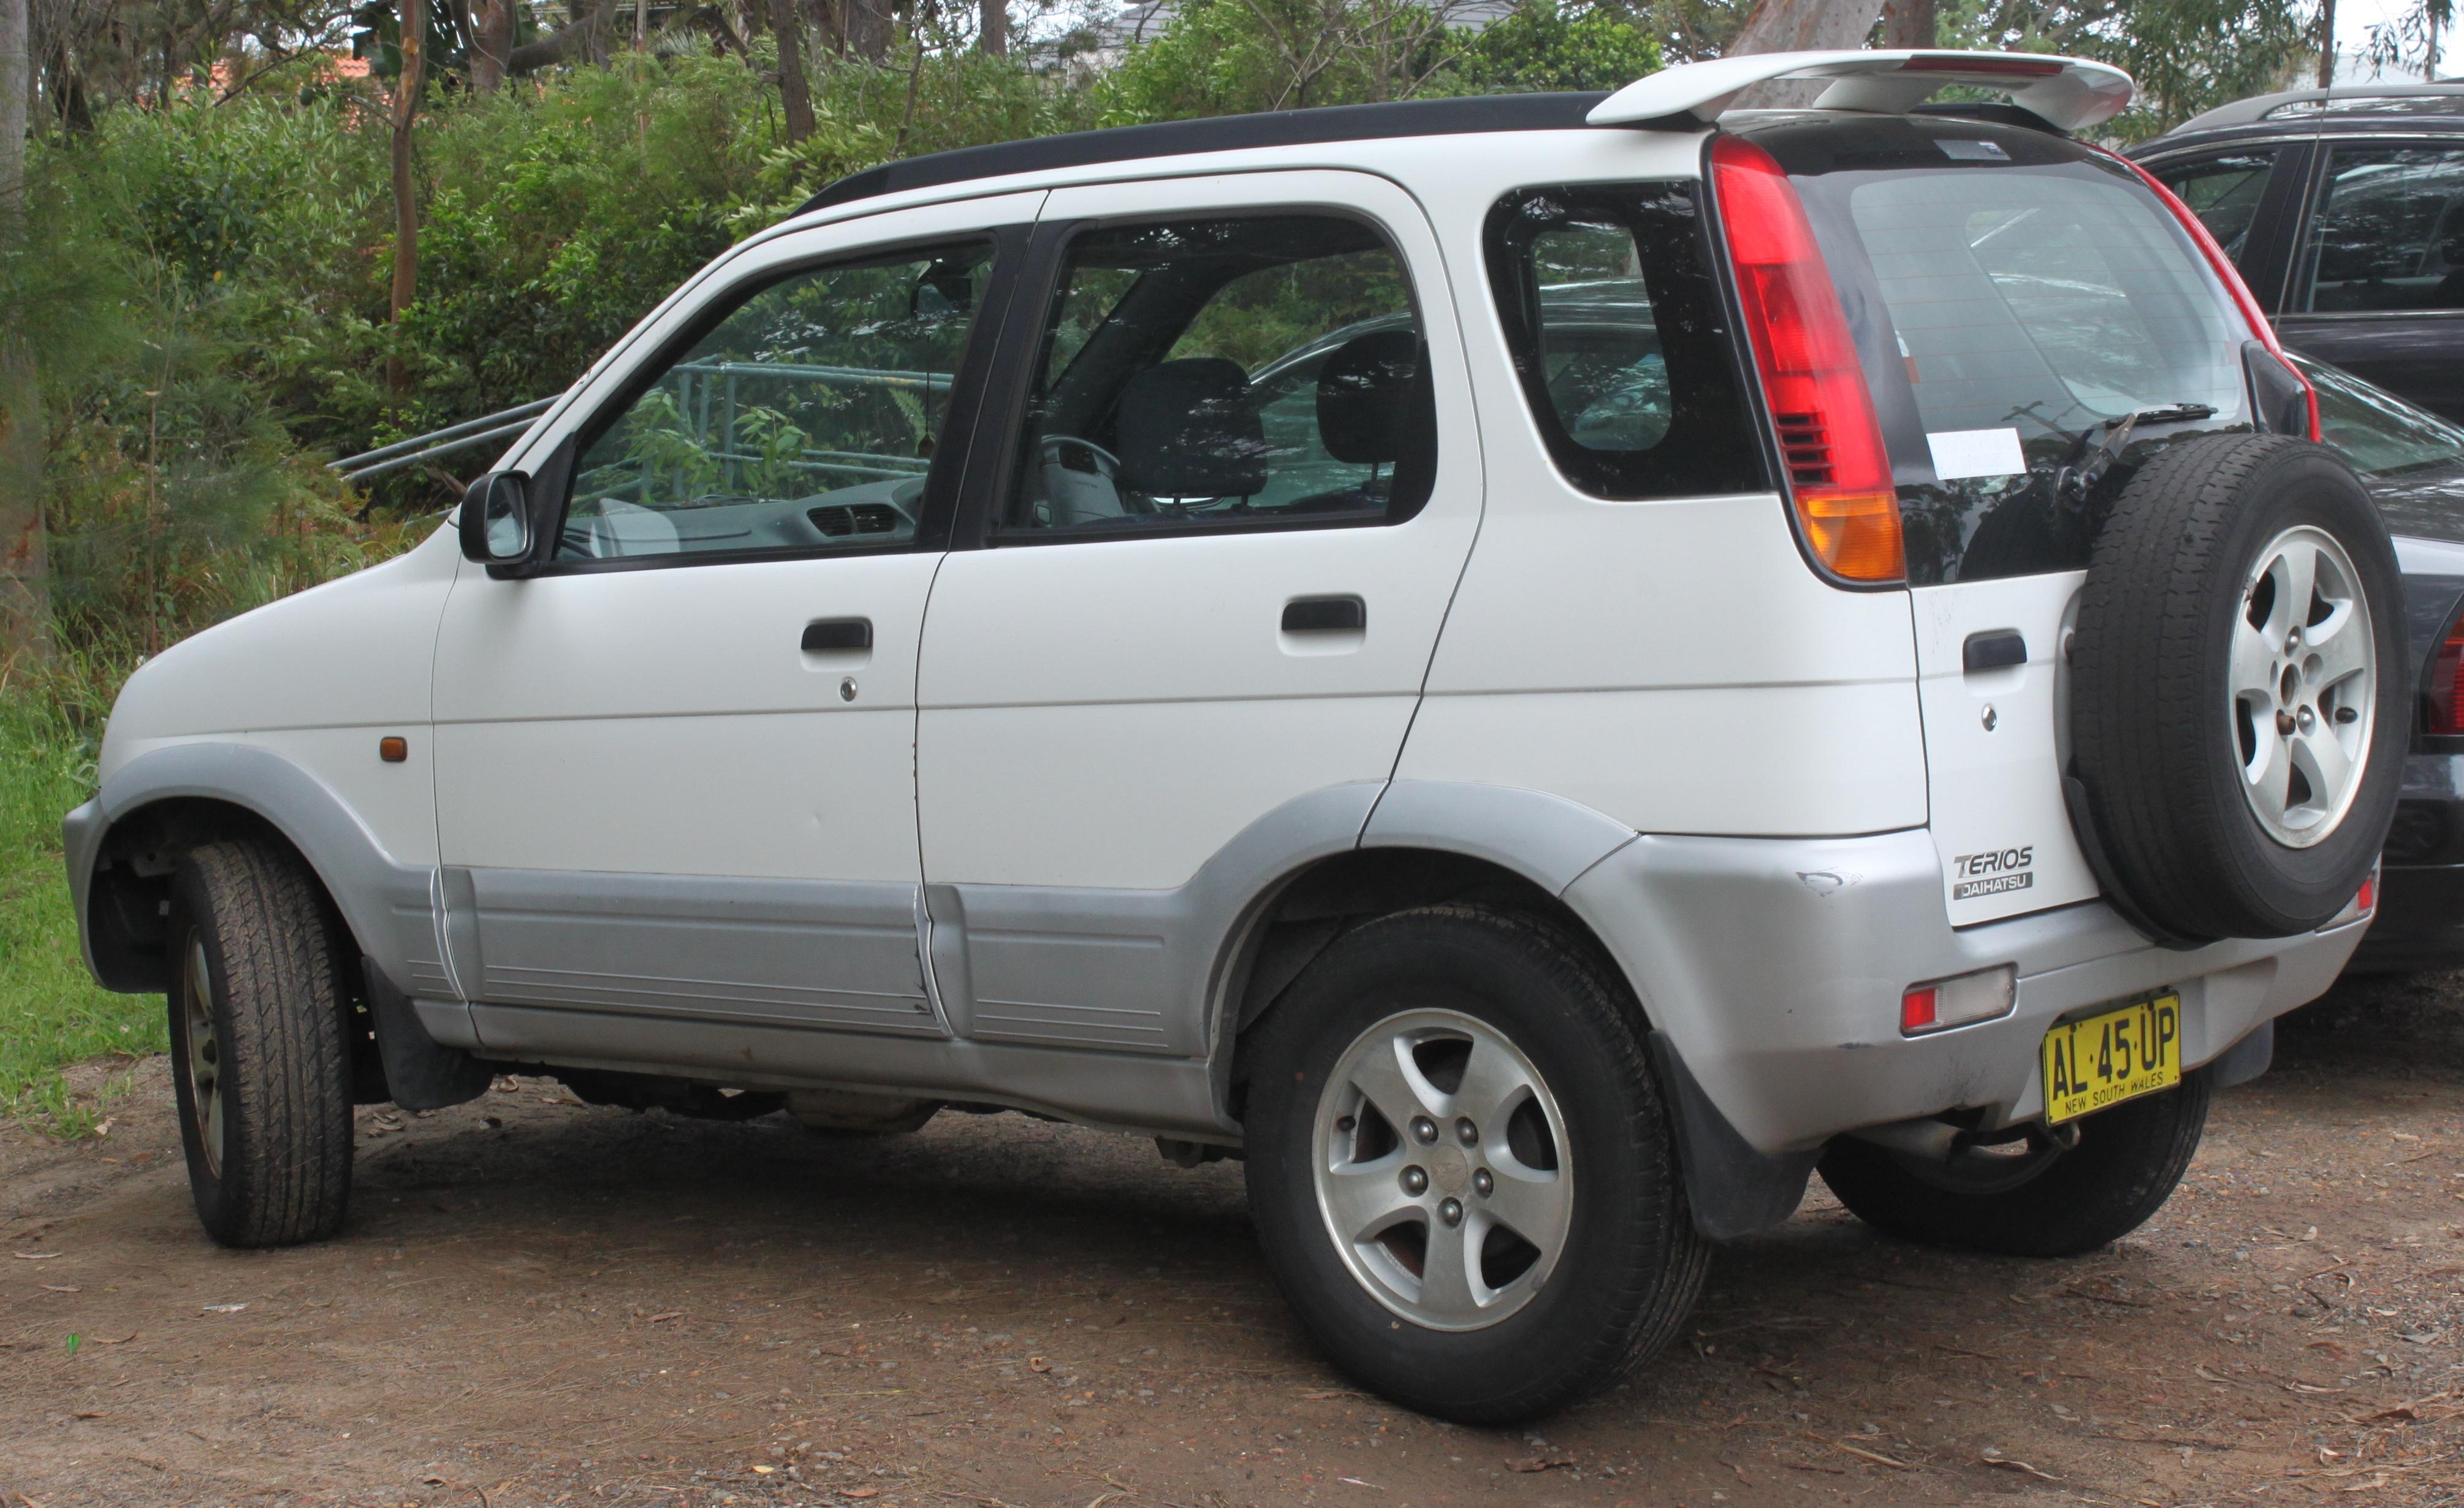 Kekurangan Toyota Terios Perbandingan Harga